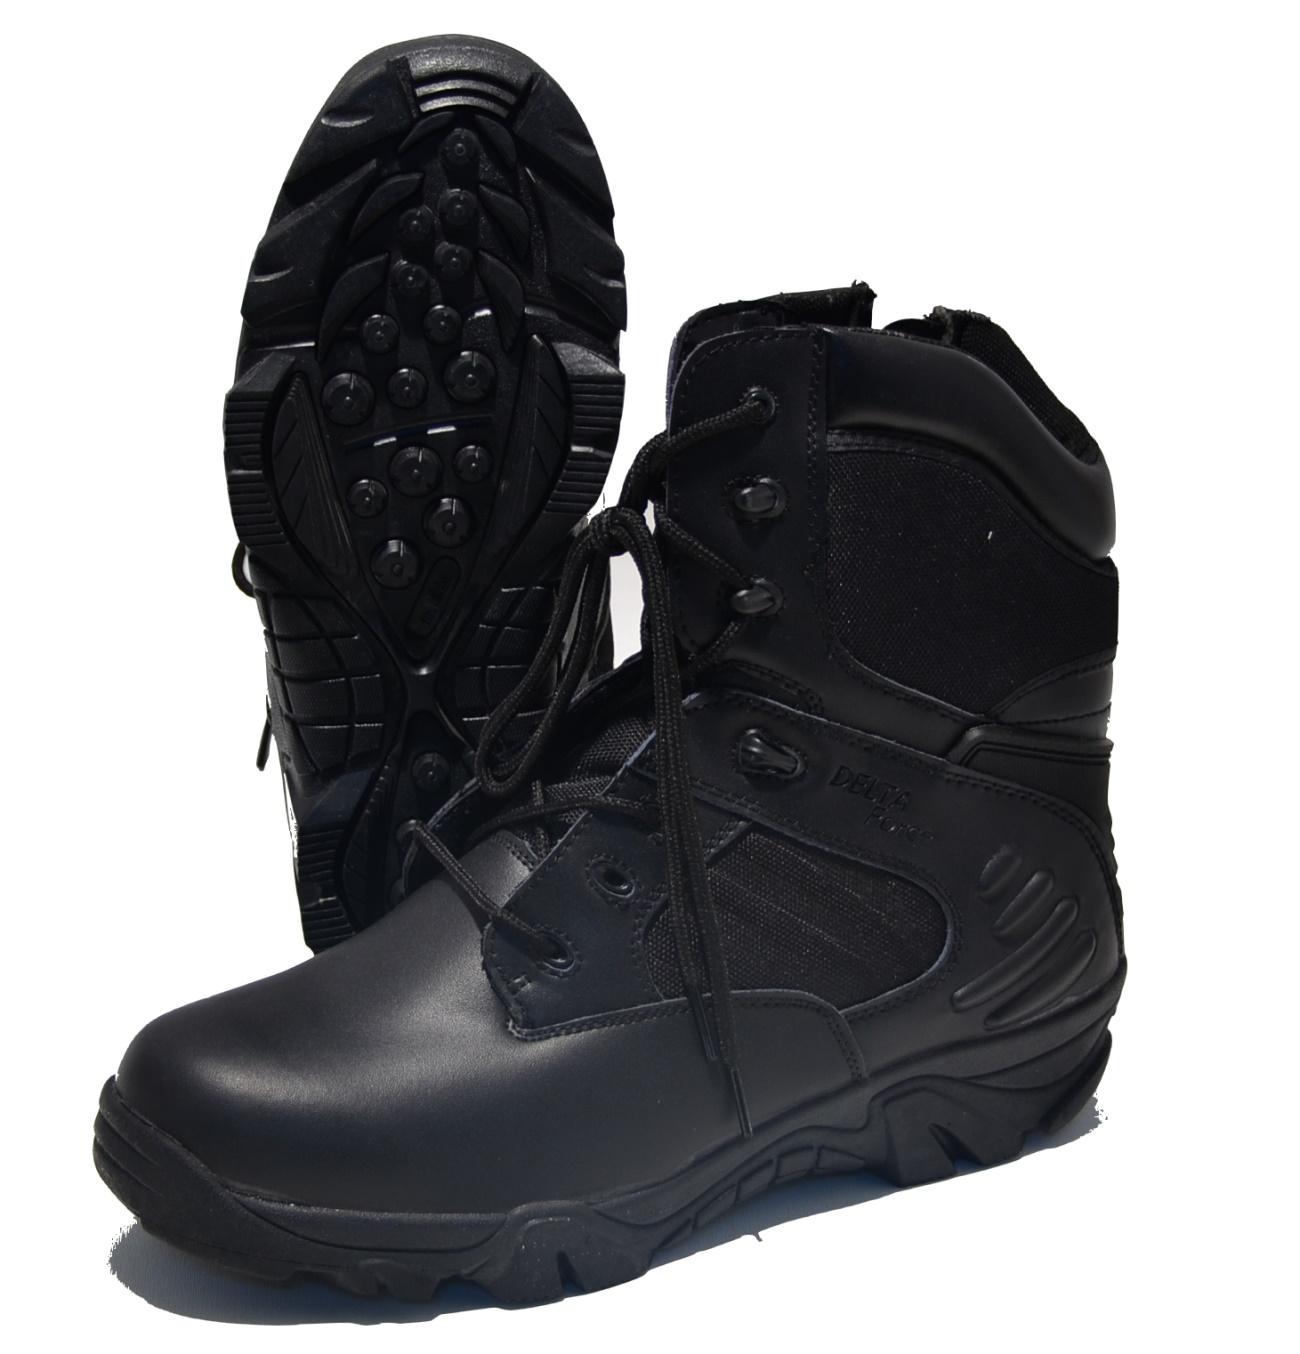 414d3730a1ea55 MC Allister Outdoor Boots Delta Force in schwarz - MC Allister Shop ...